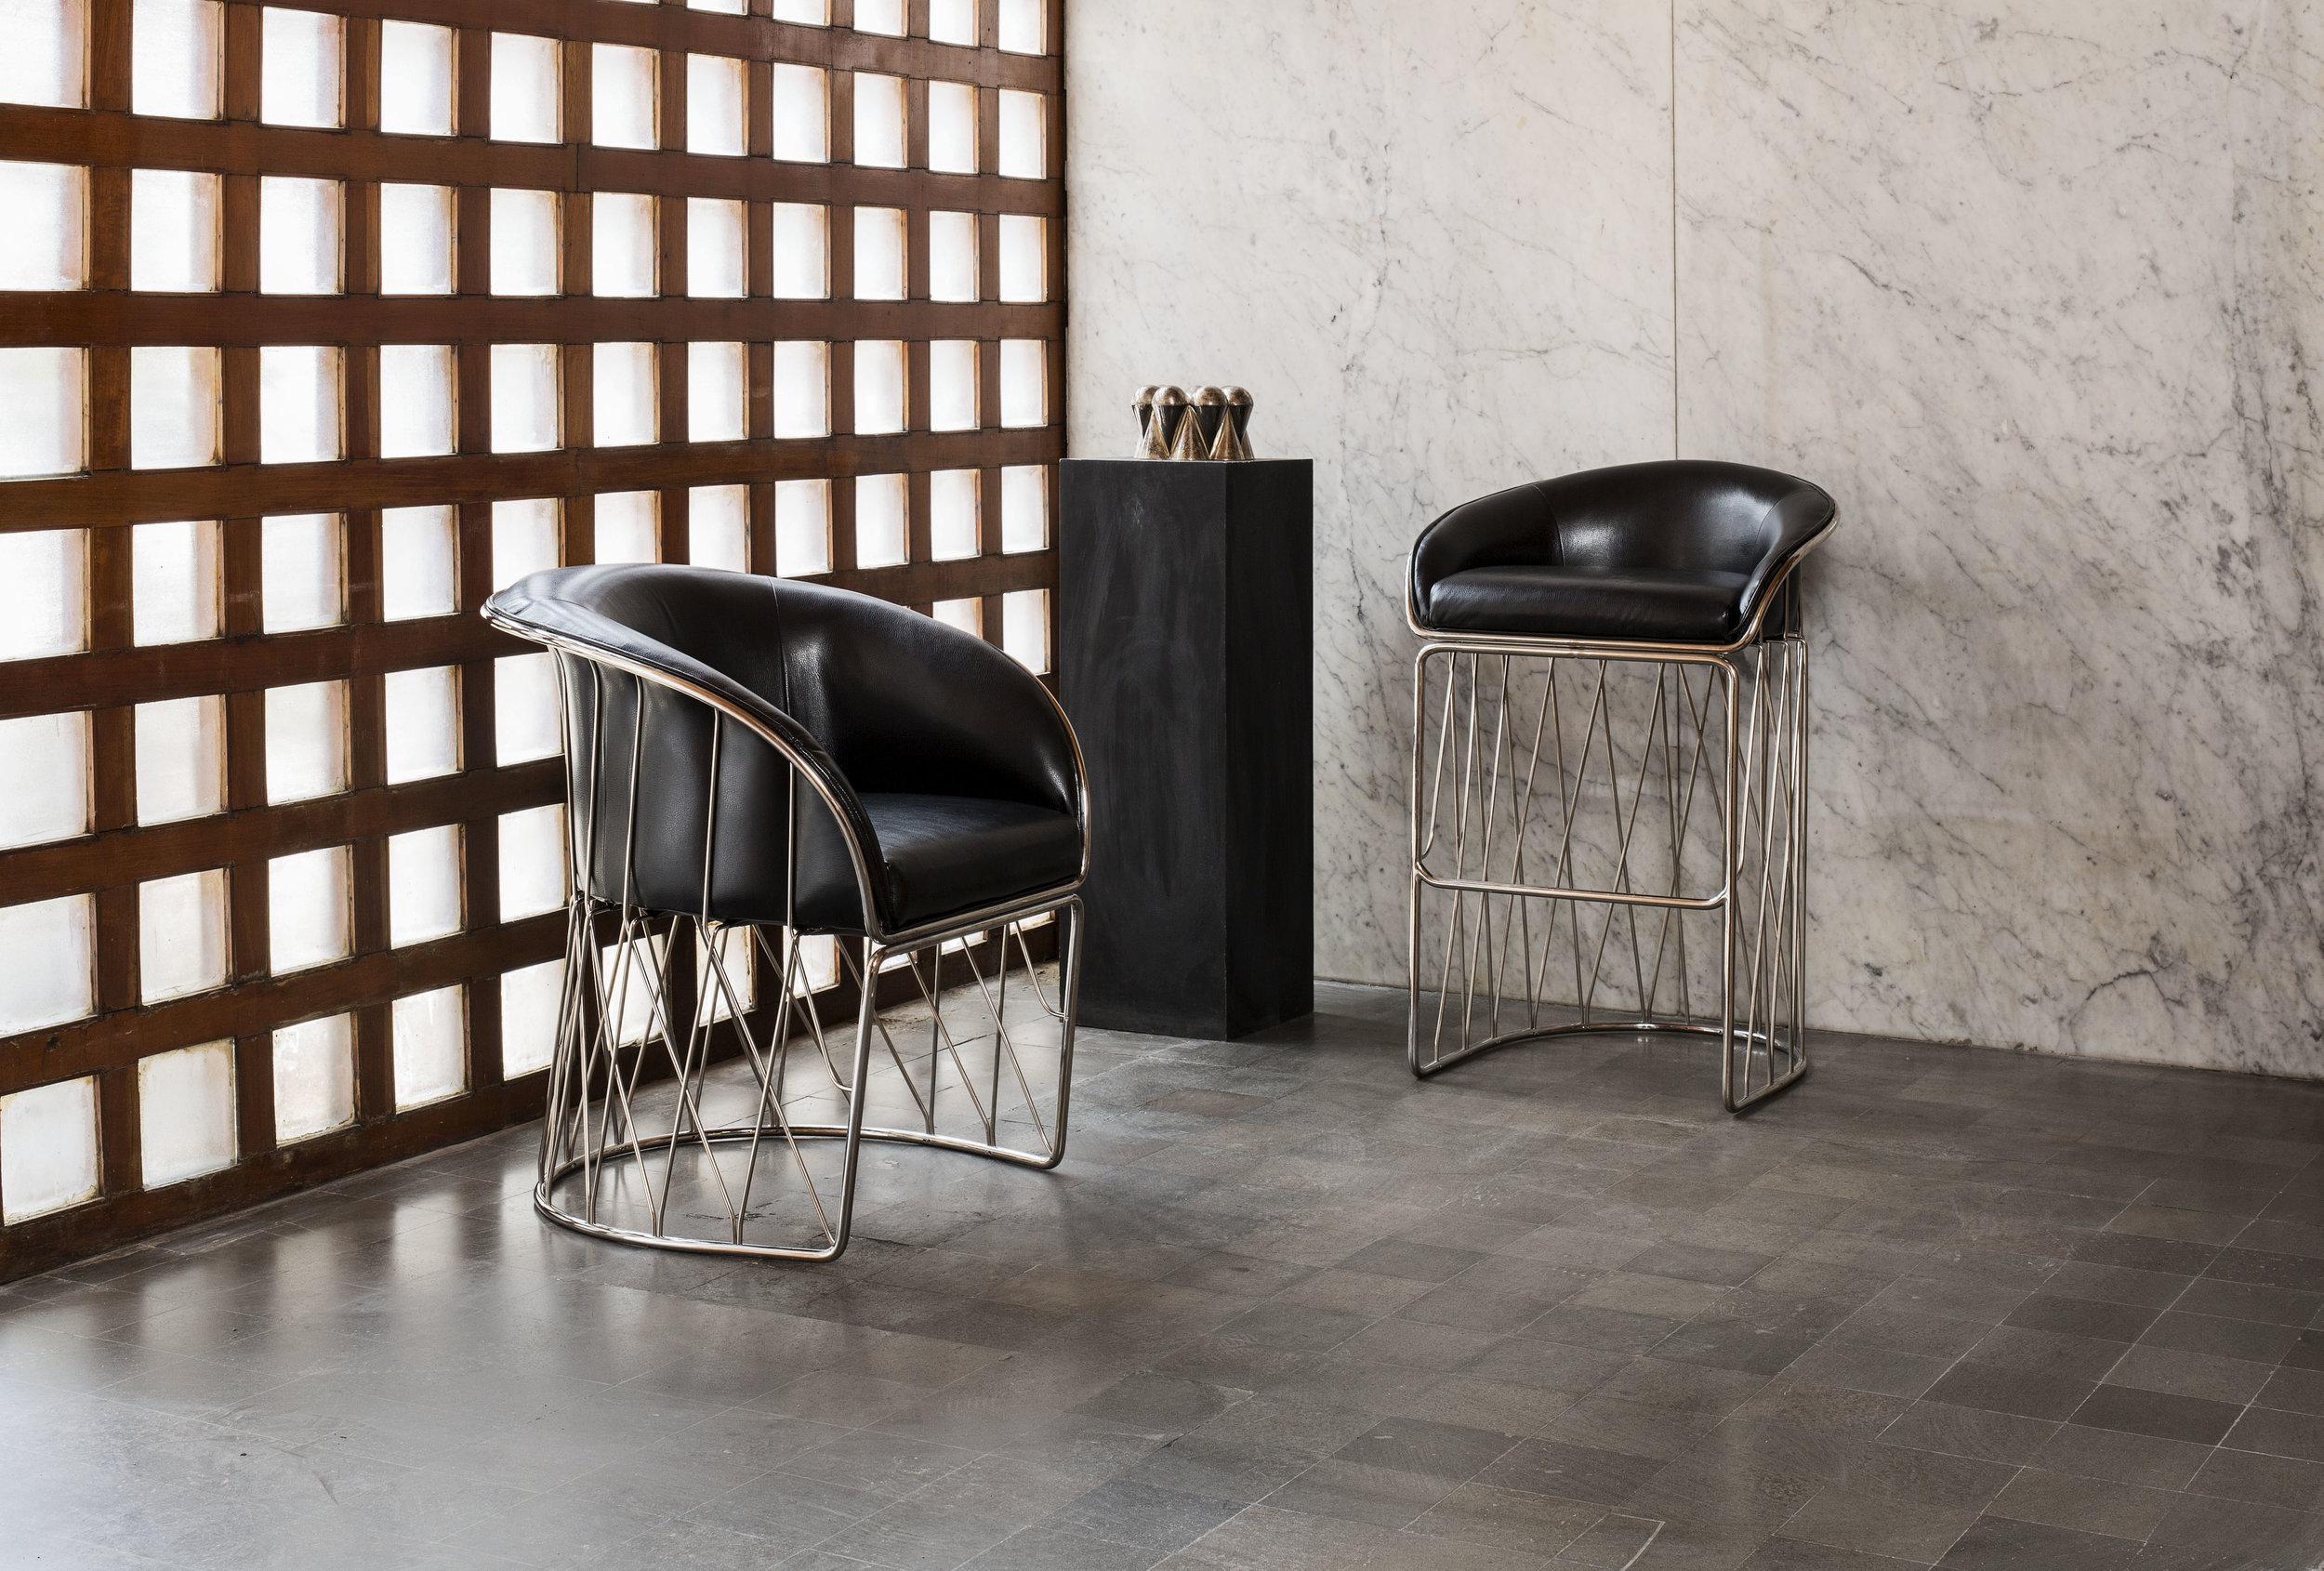 Luteca-PRV-Equipal Chair-Equipal Barstool-1.jpg